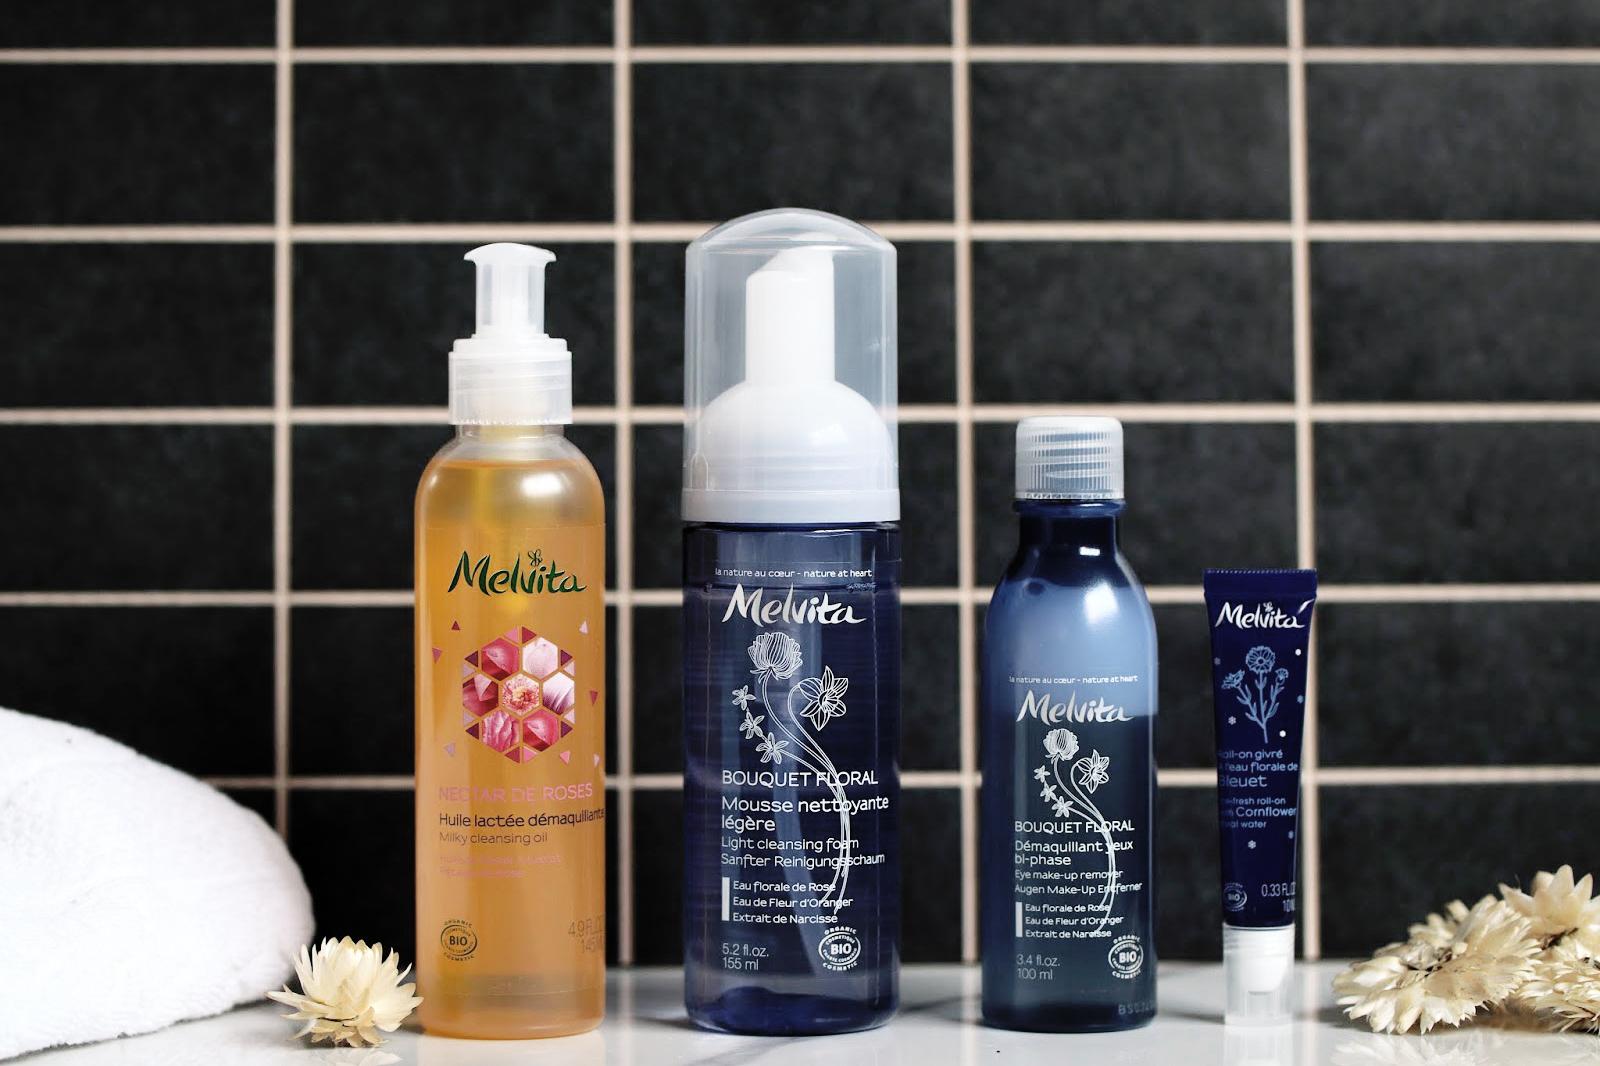 melvita nettoyage de peau demaquillage huile demaquillante mousse avis test